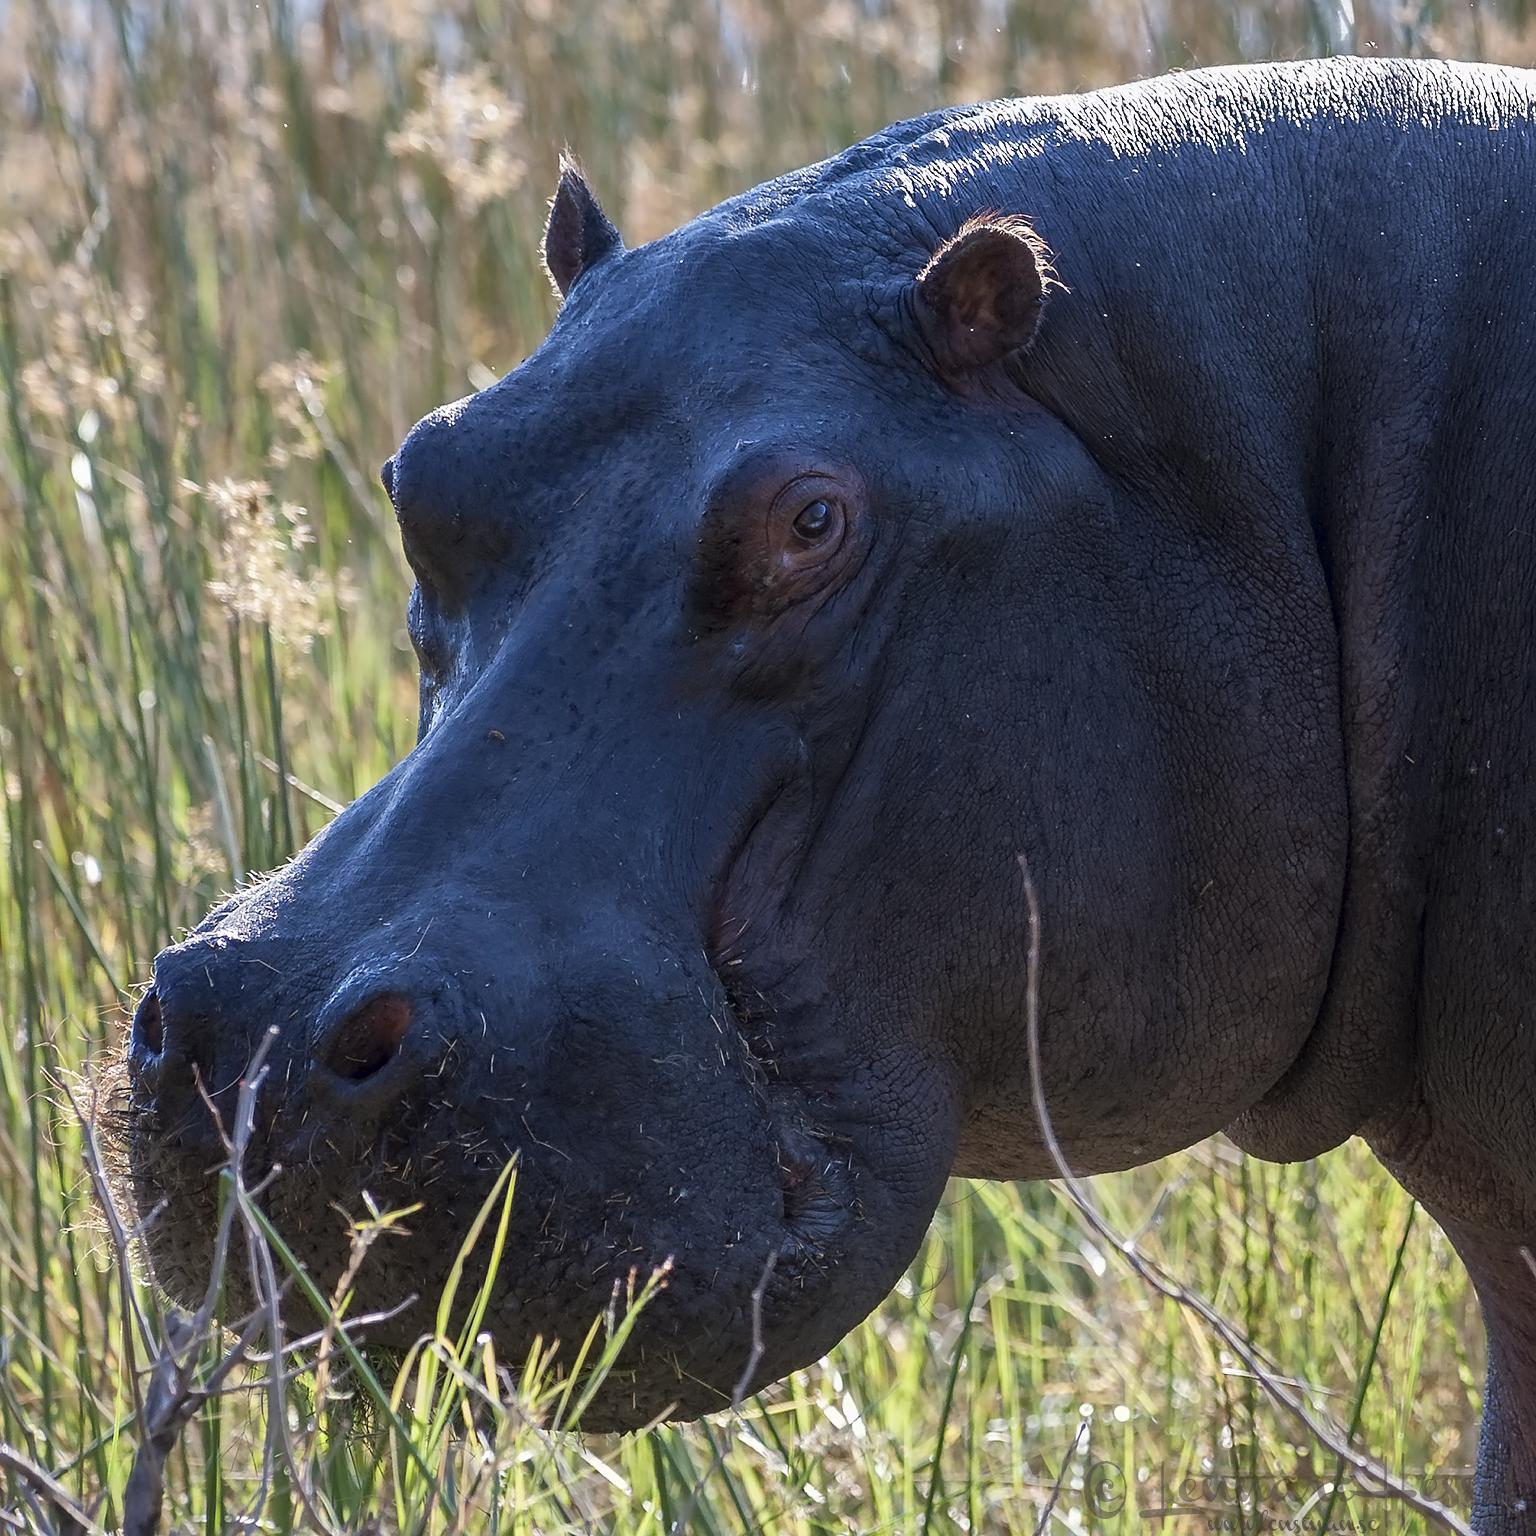 Hippopotamus in Moremi Game Reserve, Botswana